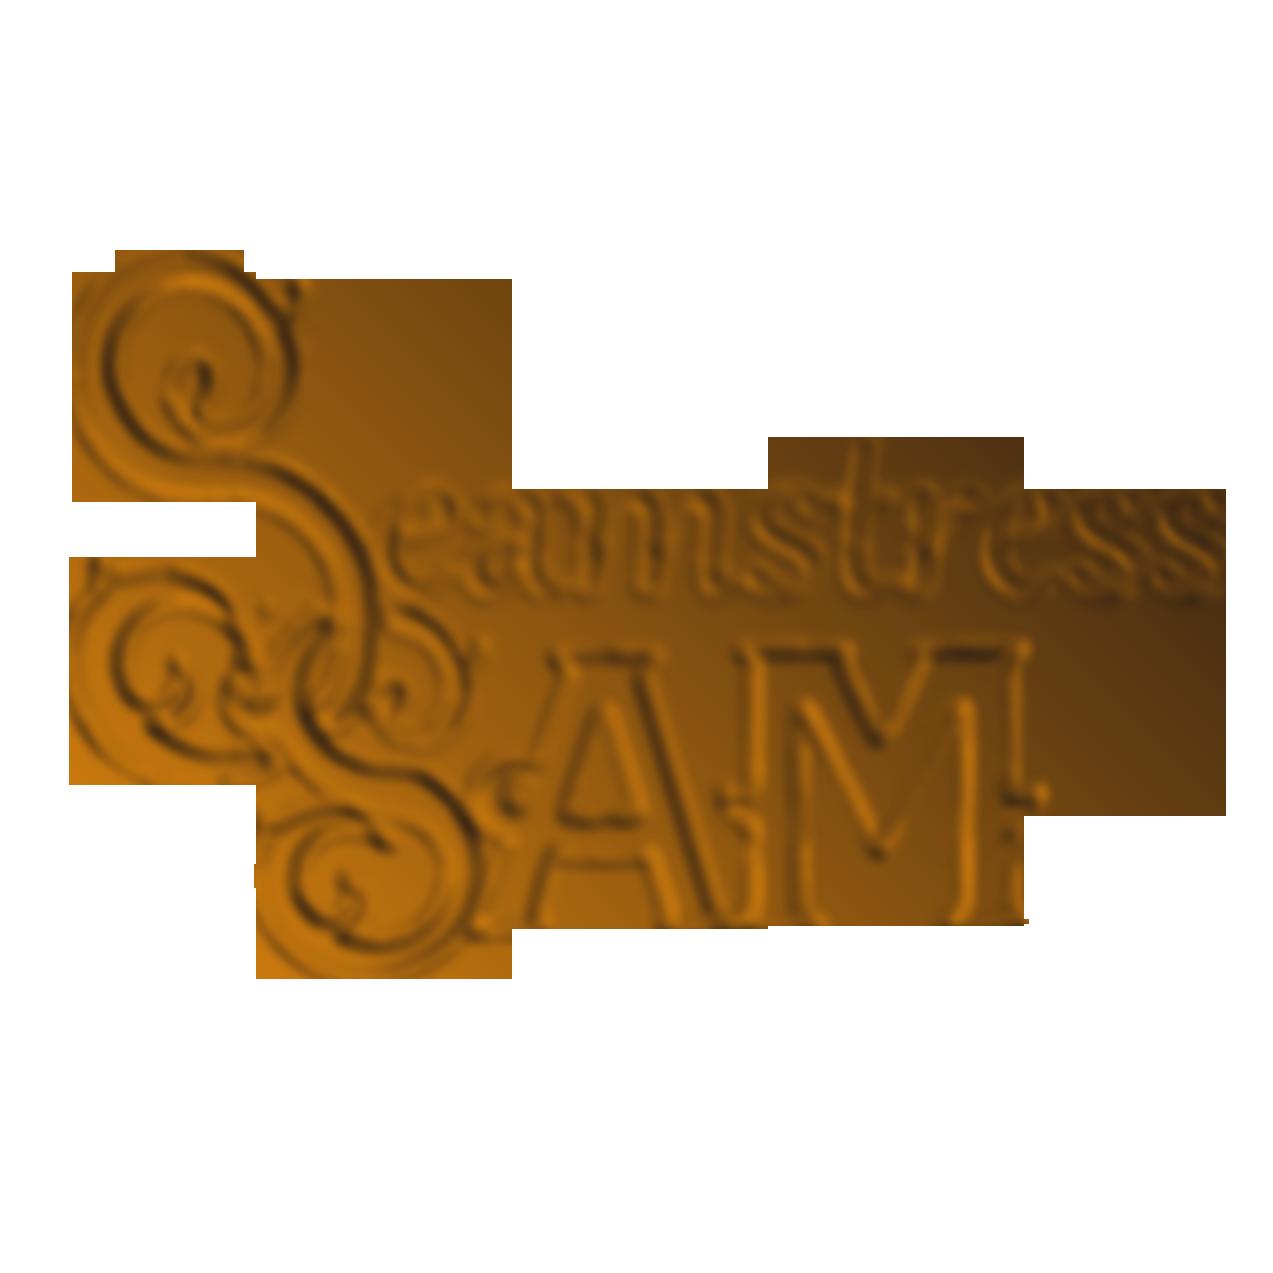 Seamstress Sam